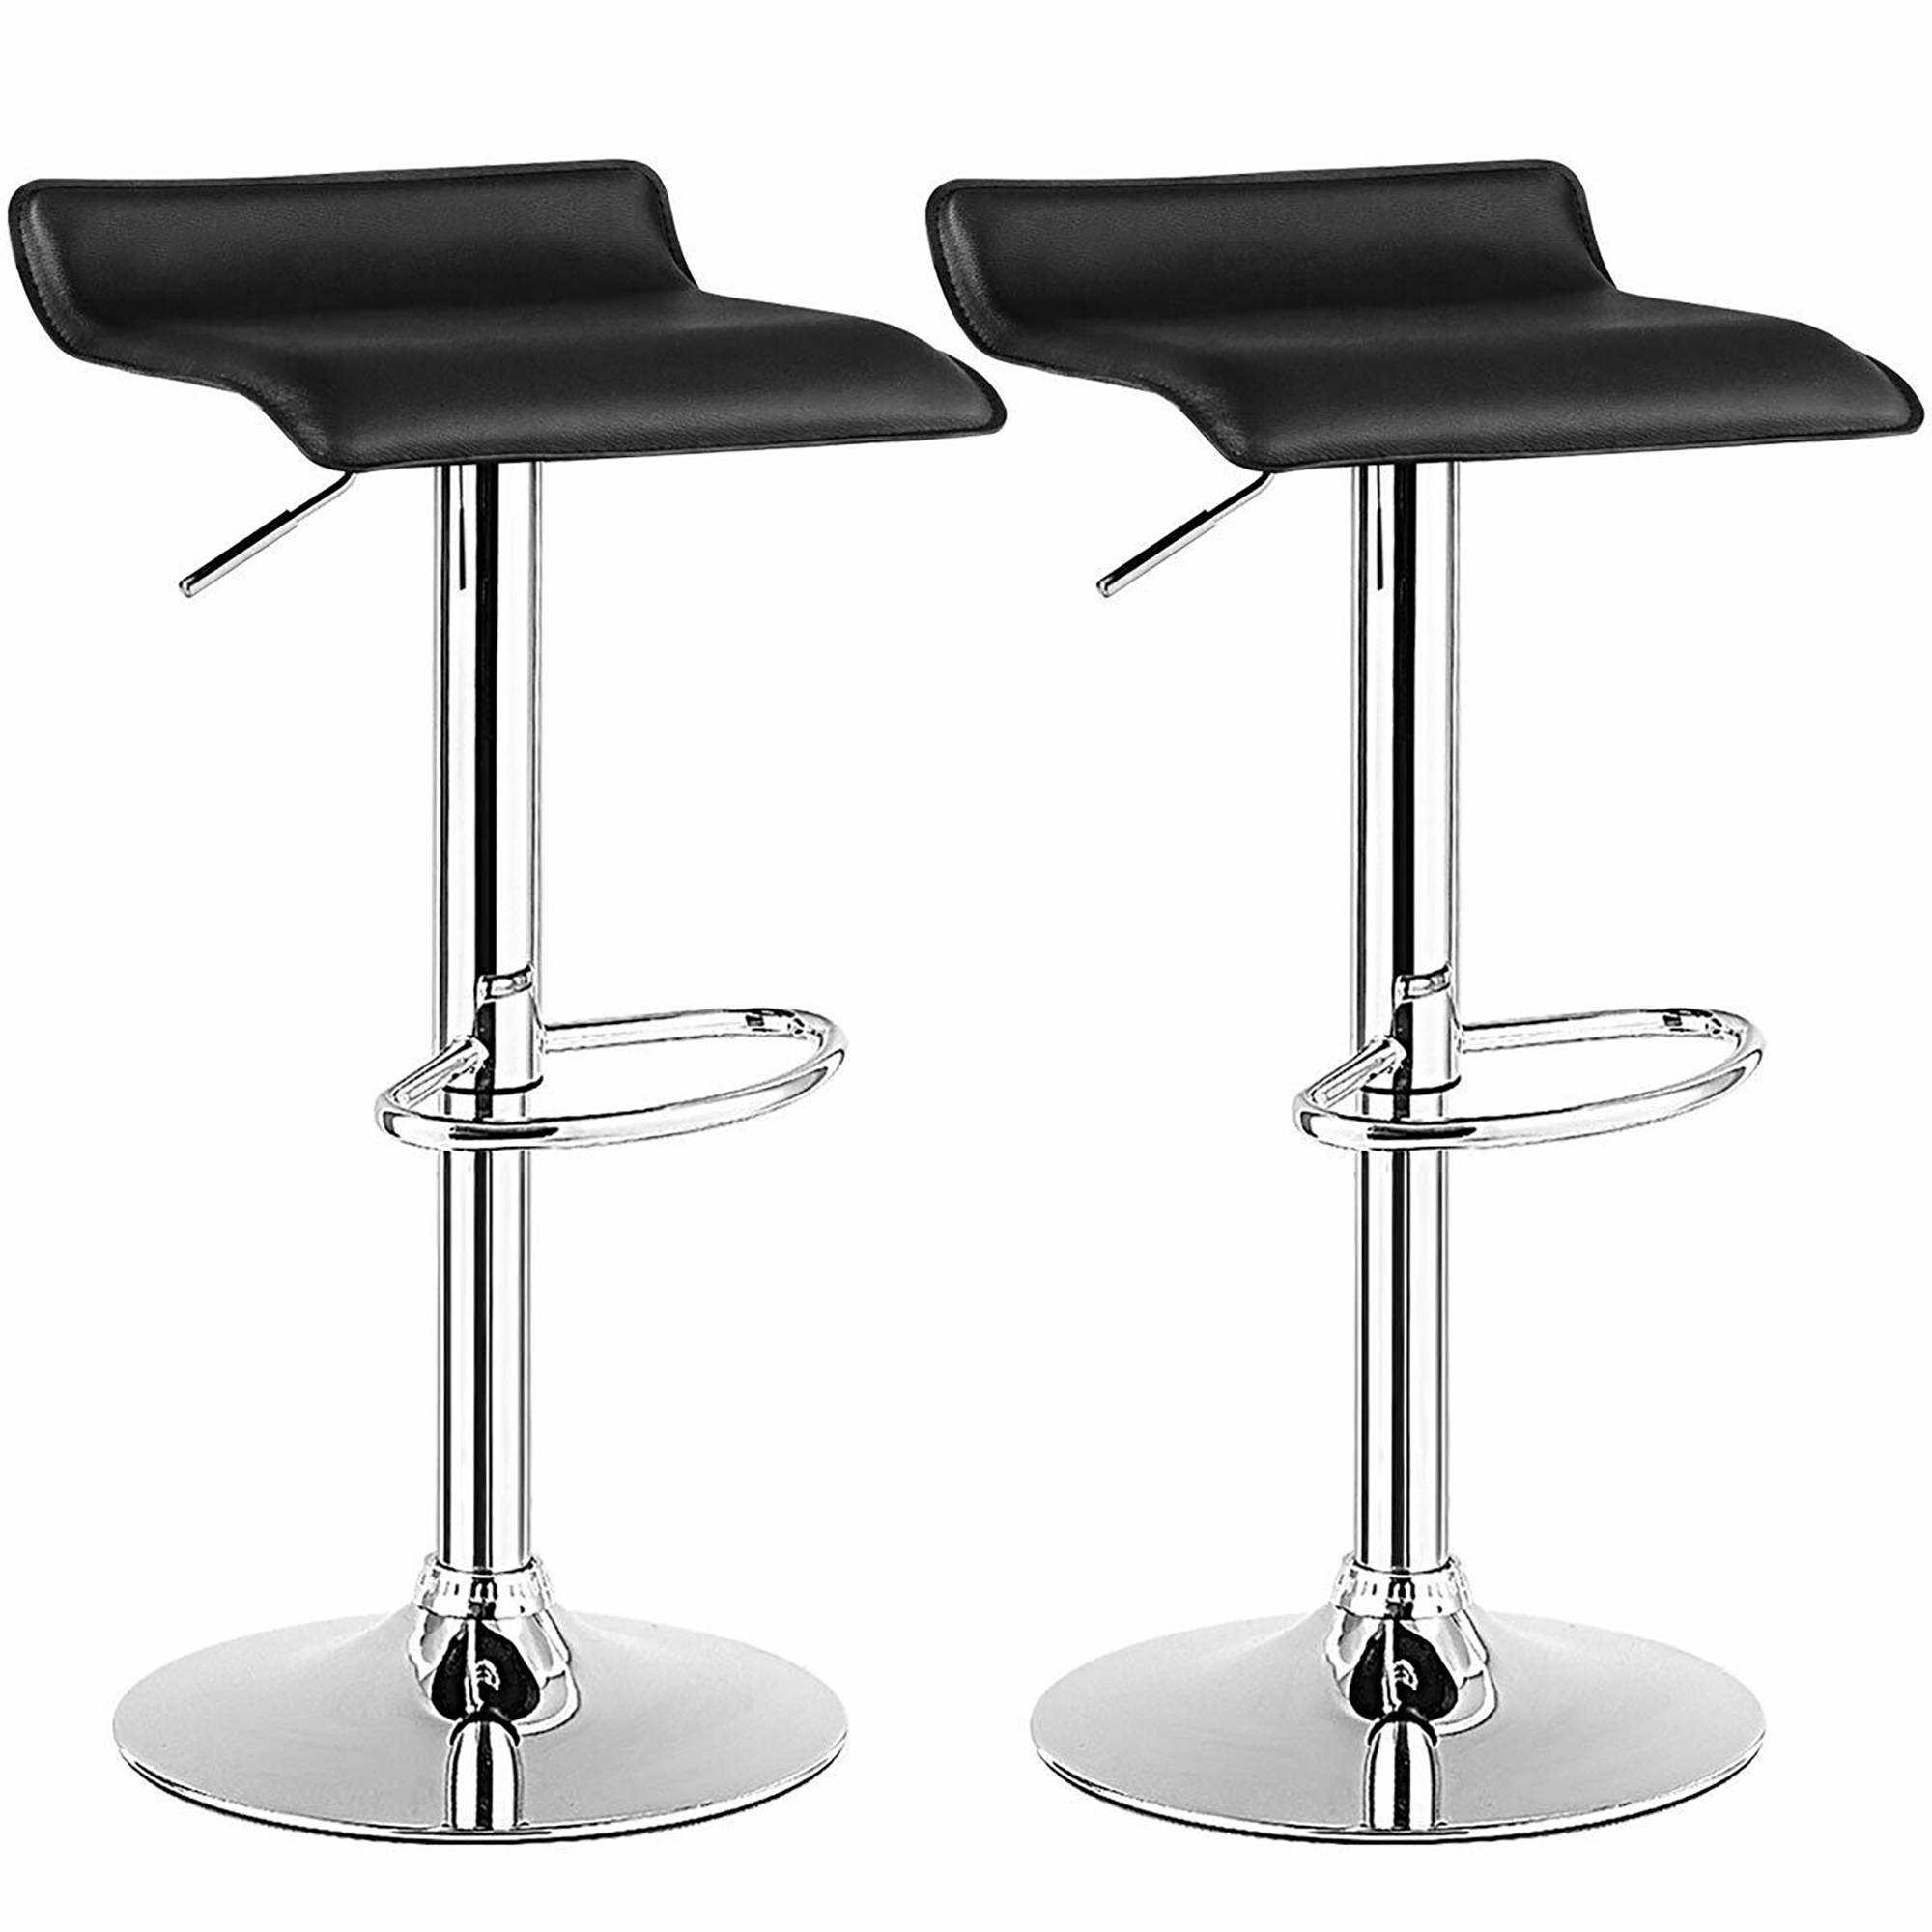 Picture of: Costway Set Of 2 Swivel Bar Stool Pu Leather Adjustable Kitchen Counter Bar Chairs Black Walmart Com Walmart Com